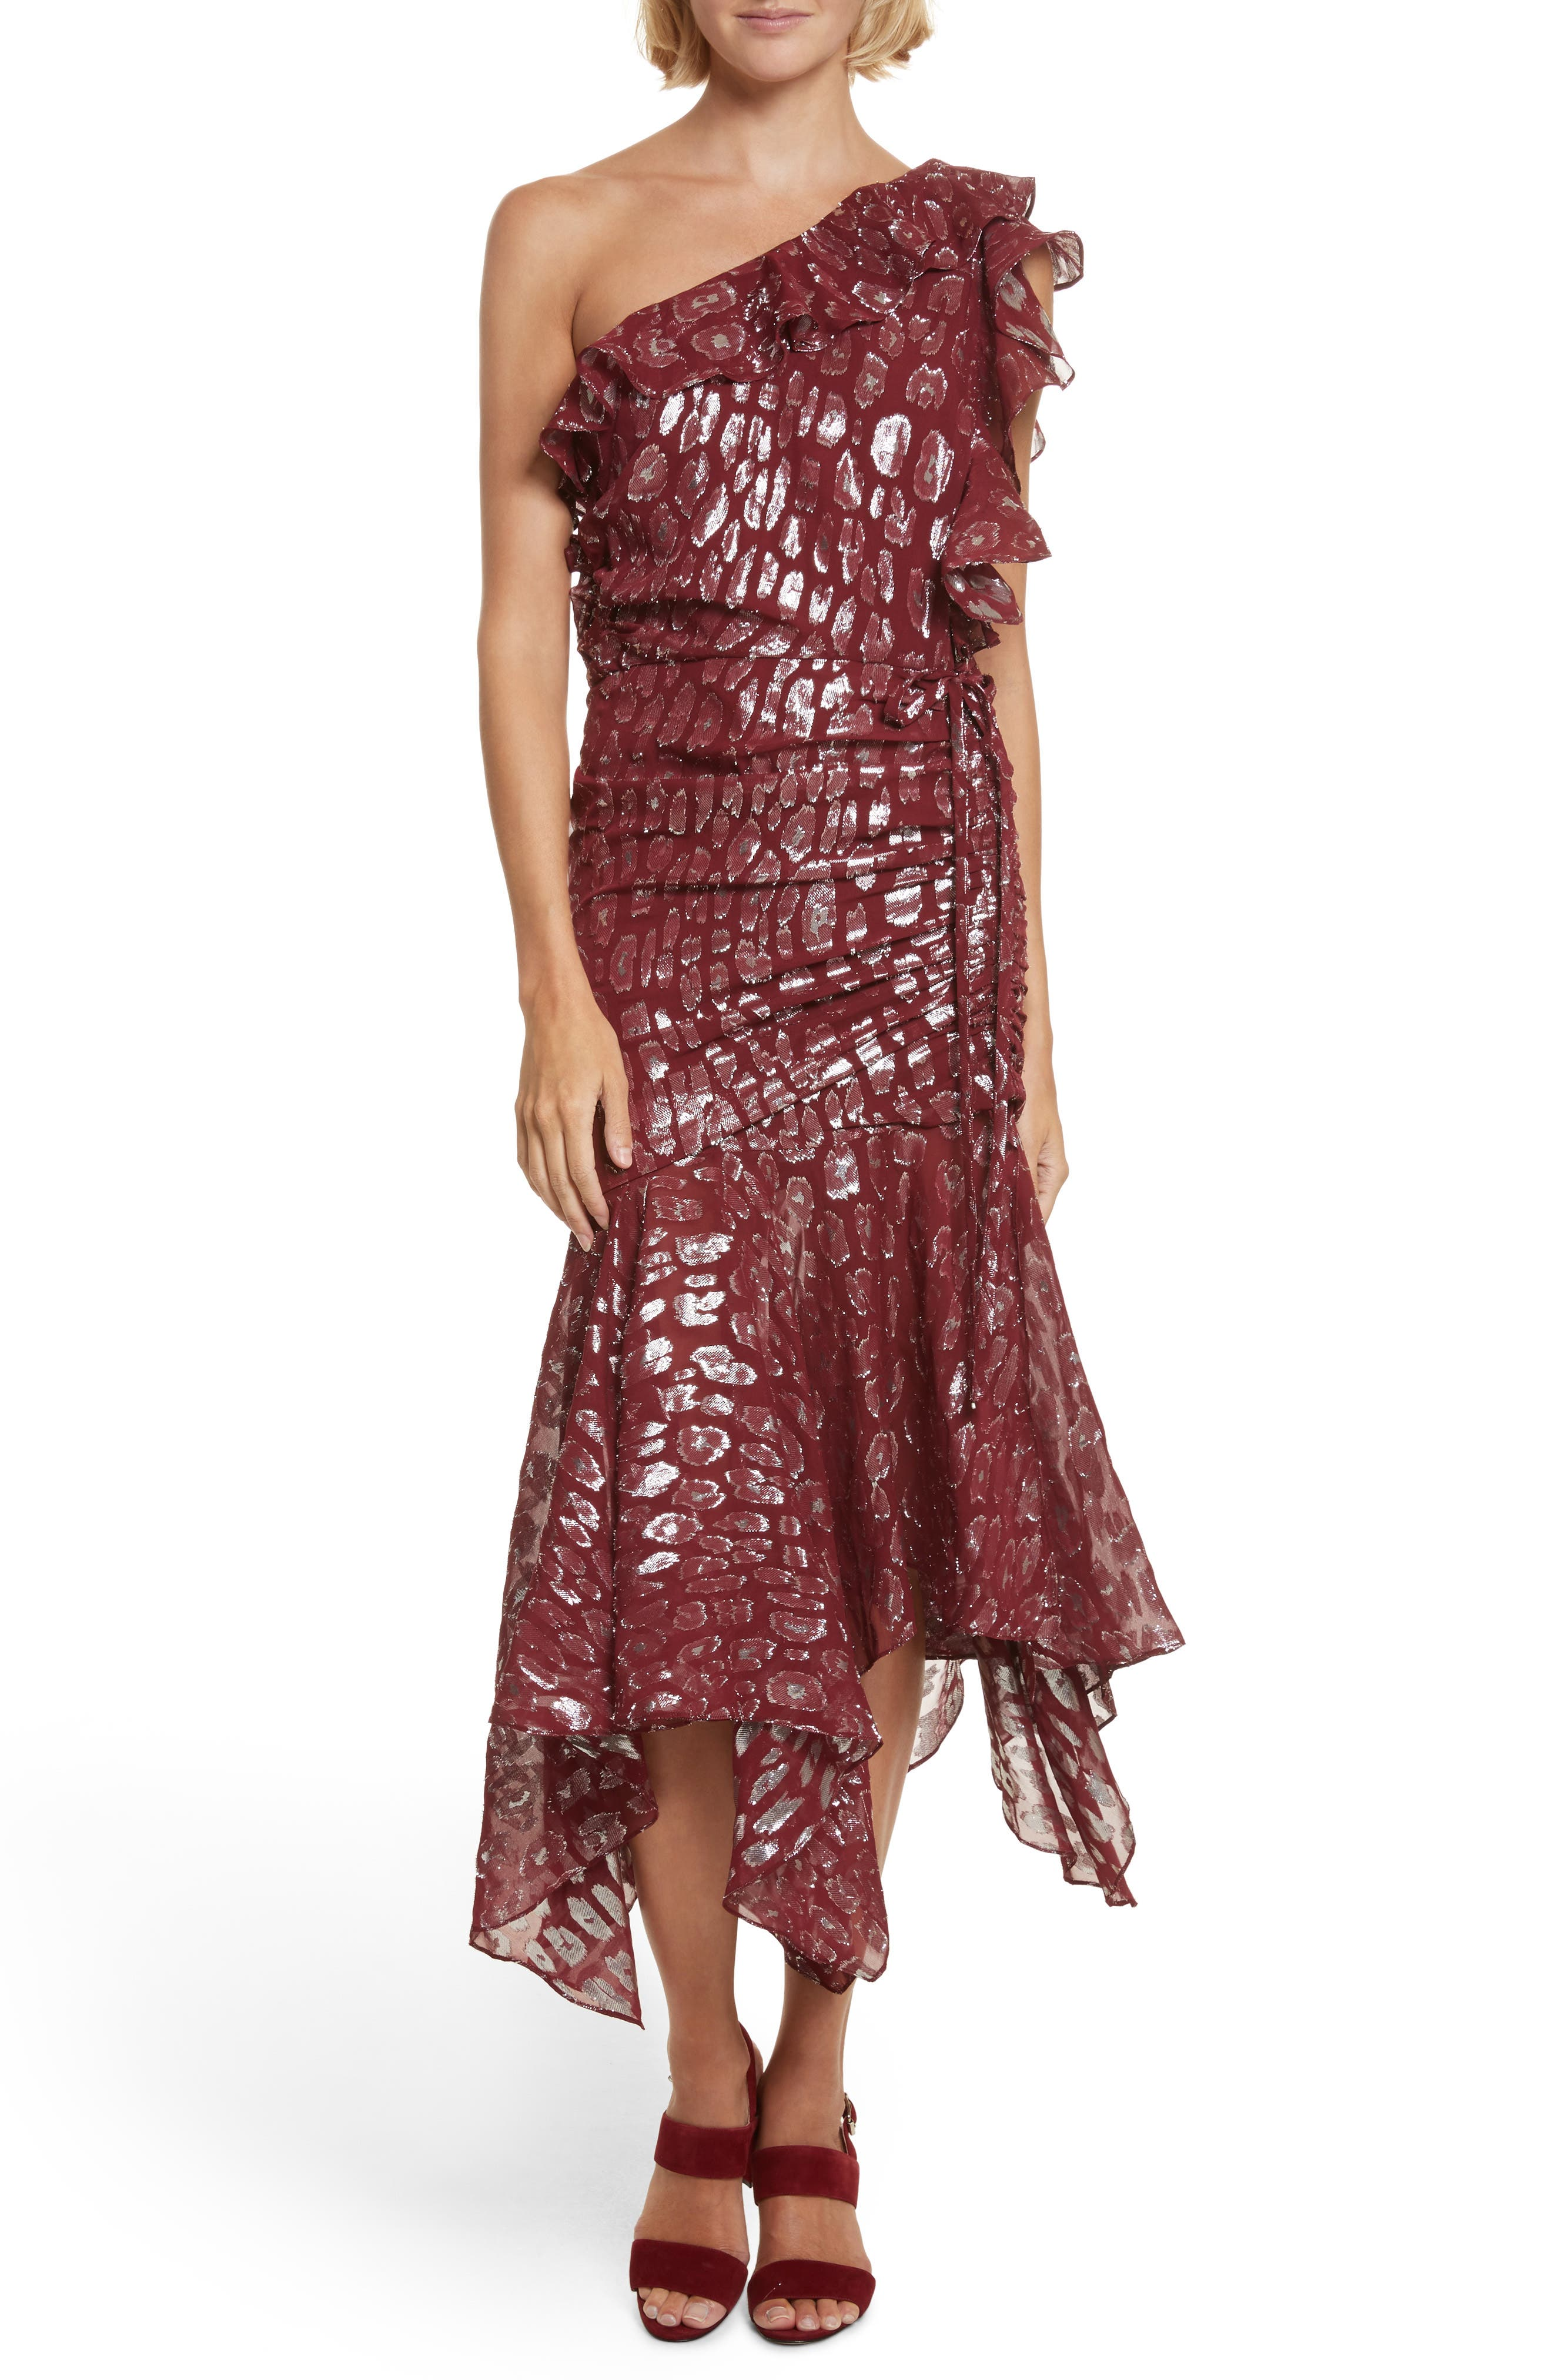 Main Image - Veronica Beard Leighton Fil Coupé One-Shoulder Dress